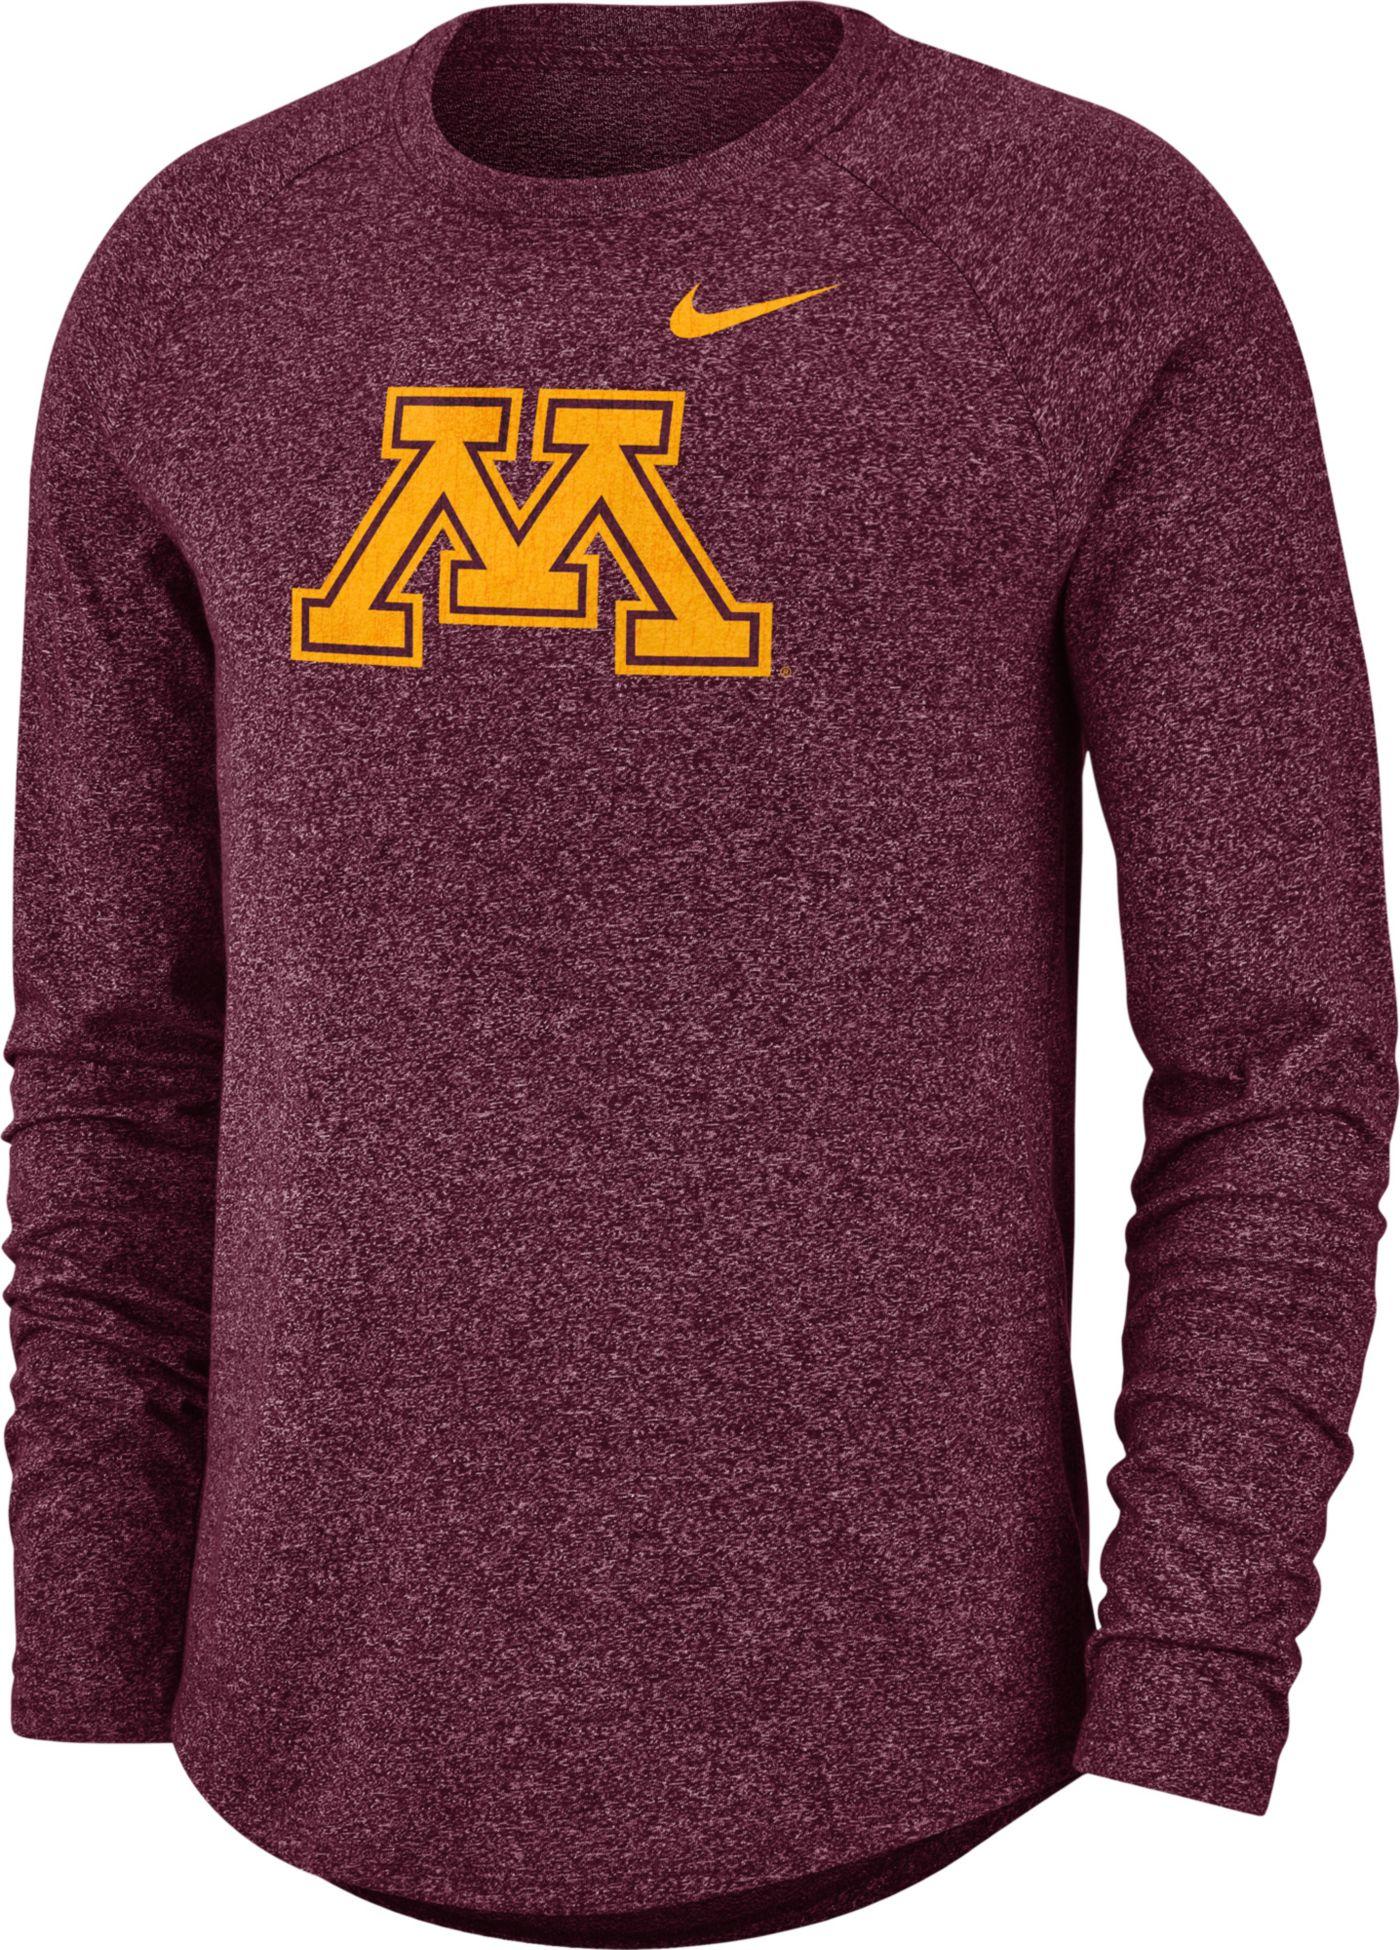 Nike Men's Minnesota Golden Gophers Maroon Marled Raglan Long Sleeve T-Shirt